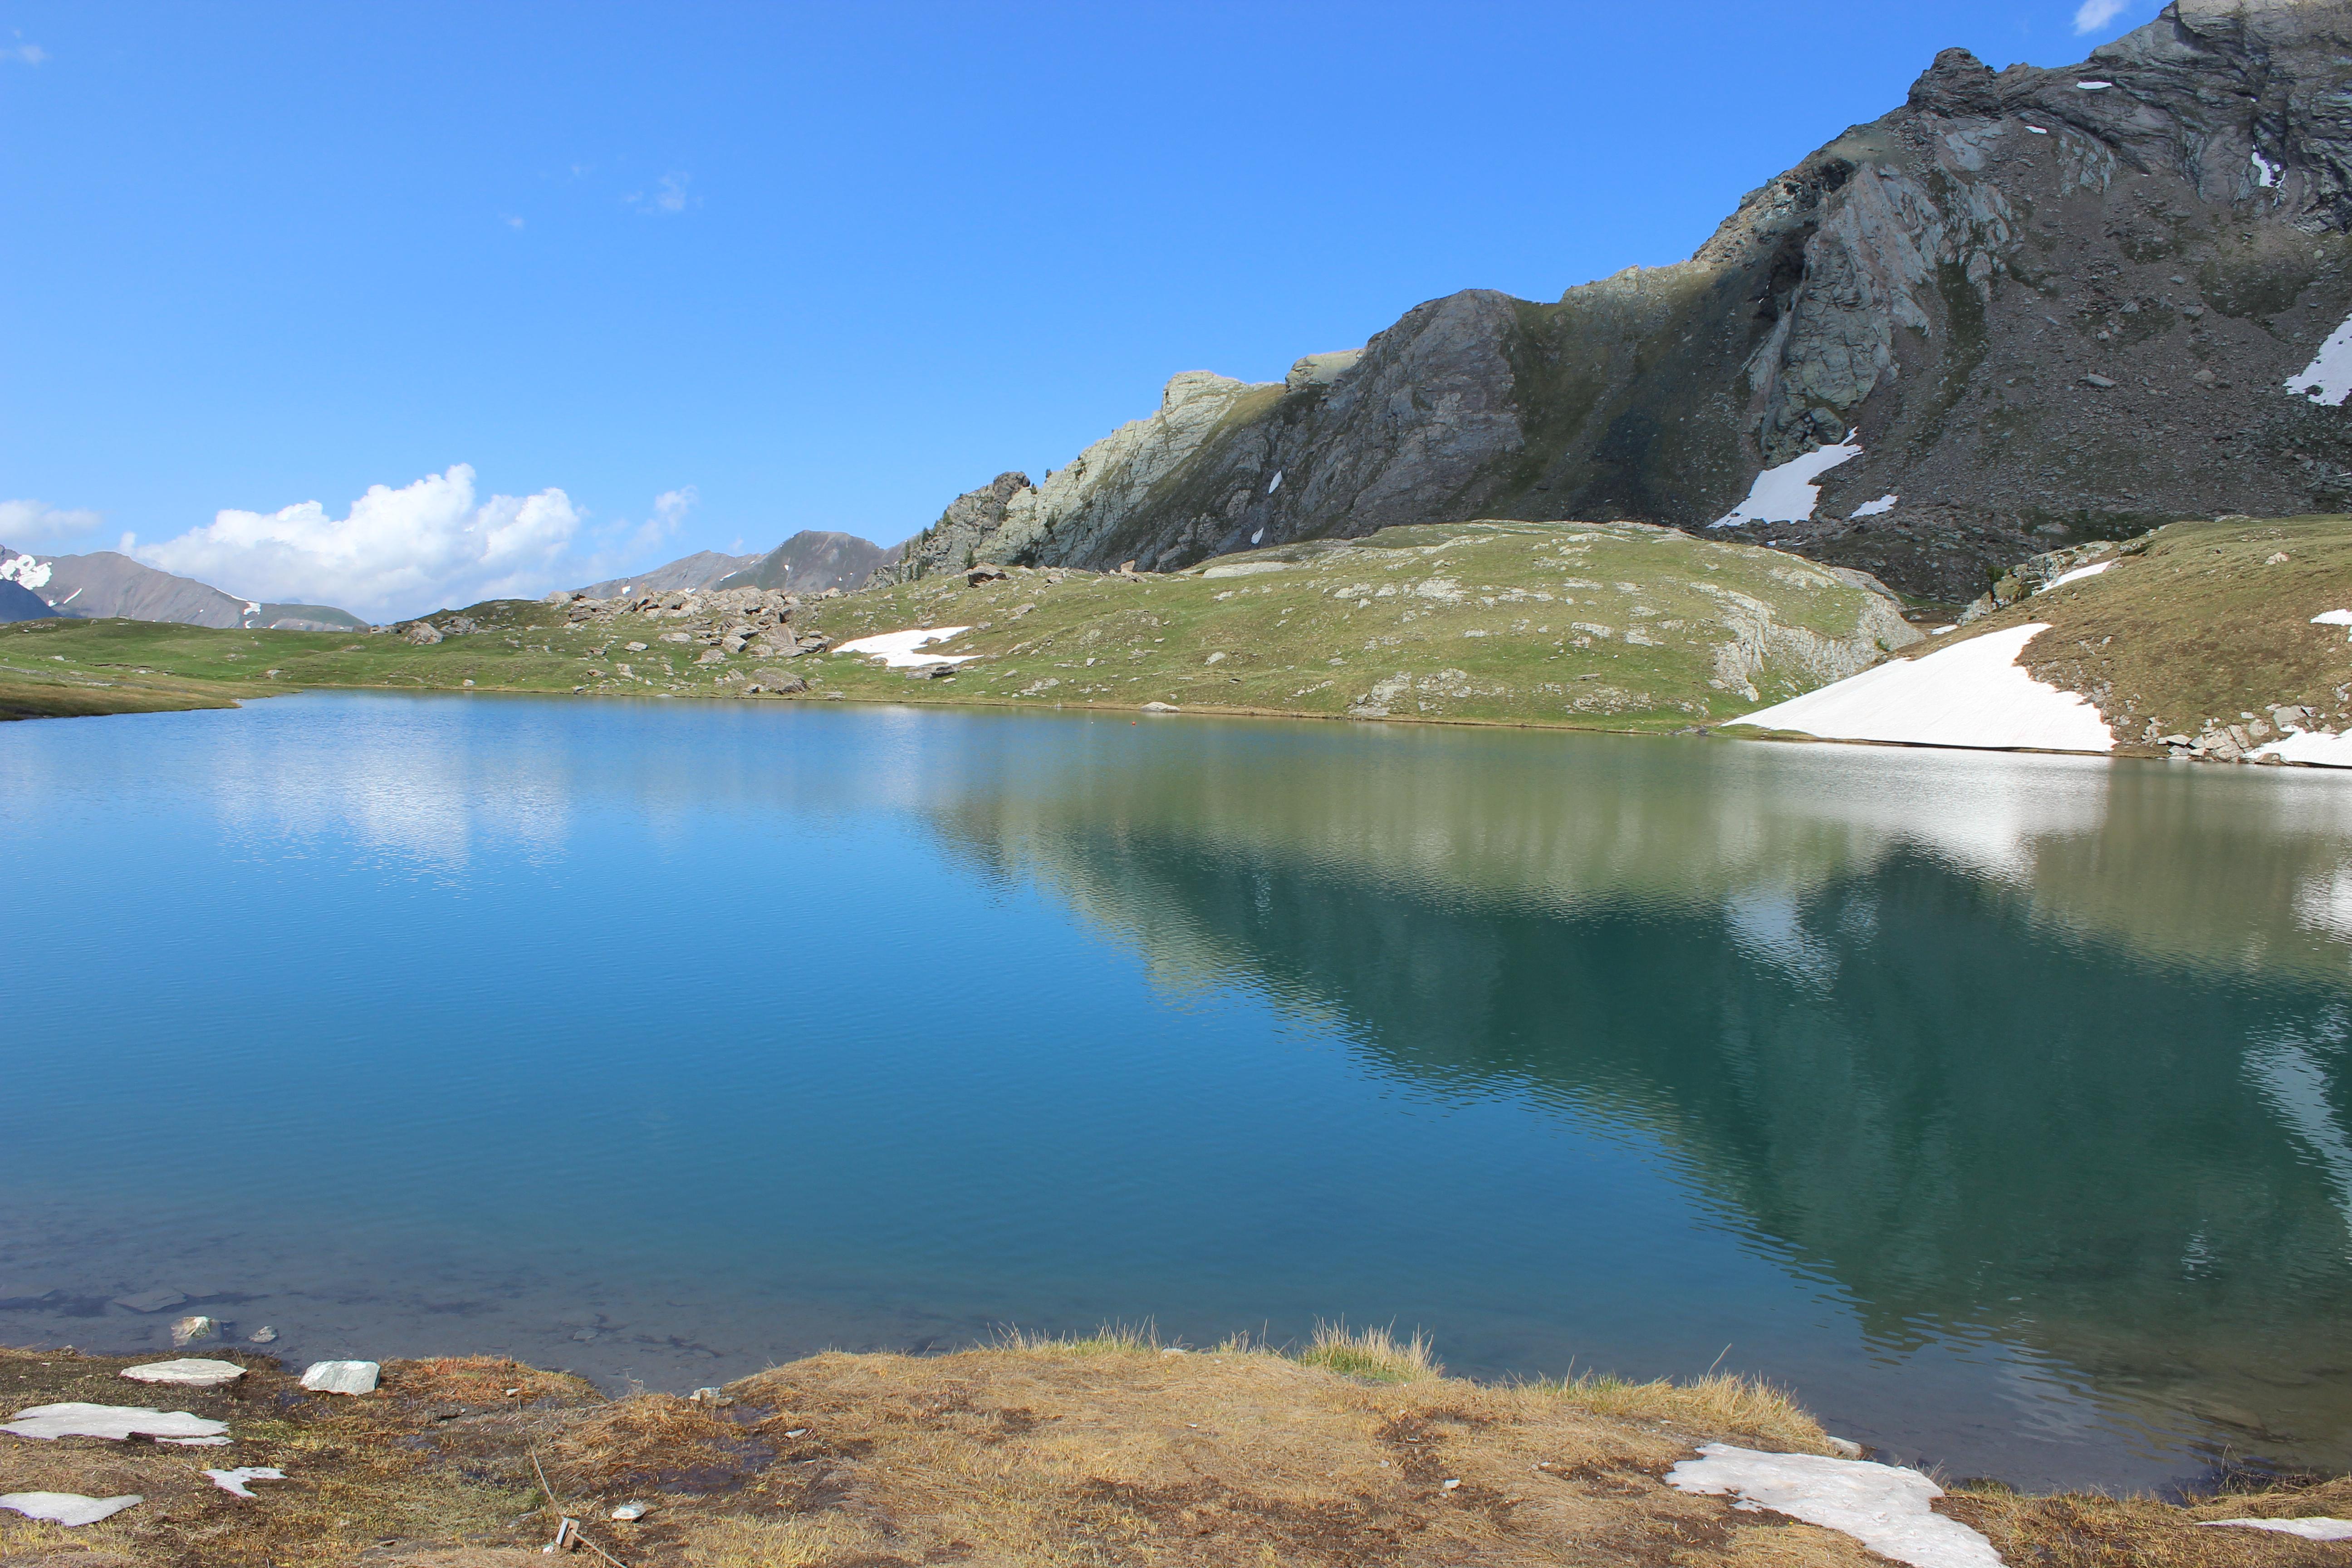 Vue sur le lac Égorgeou Commons / [https://commons.wikimedia.org/wiki/File:Lac_%C3%89gorgeou_nord-est.JPG Juraastro].